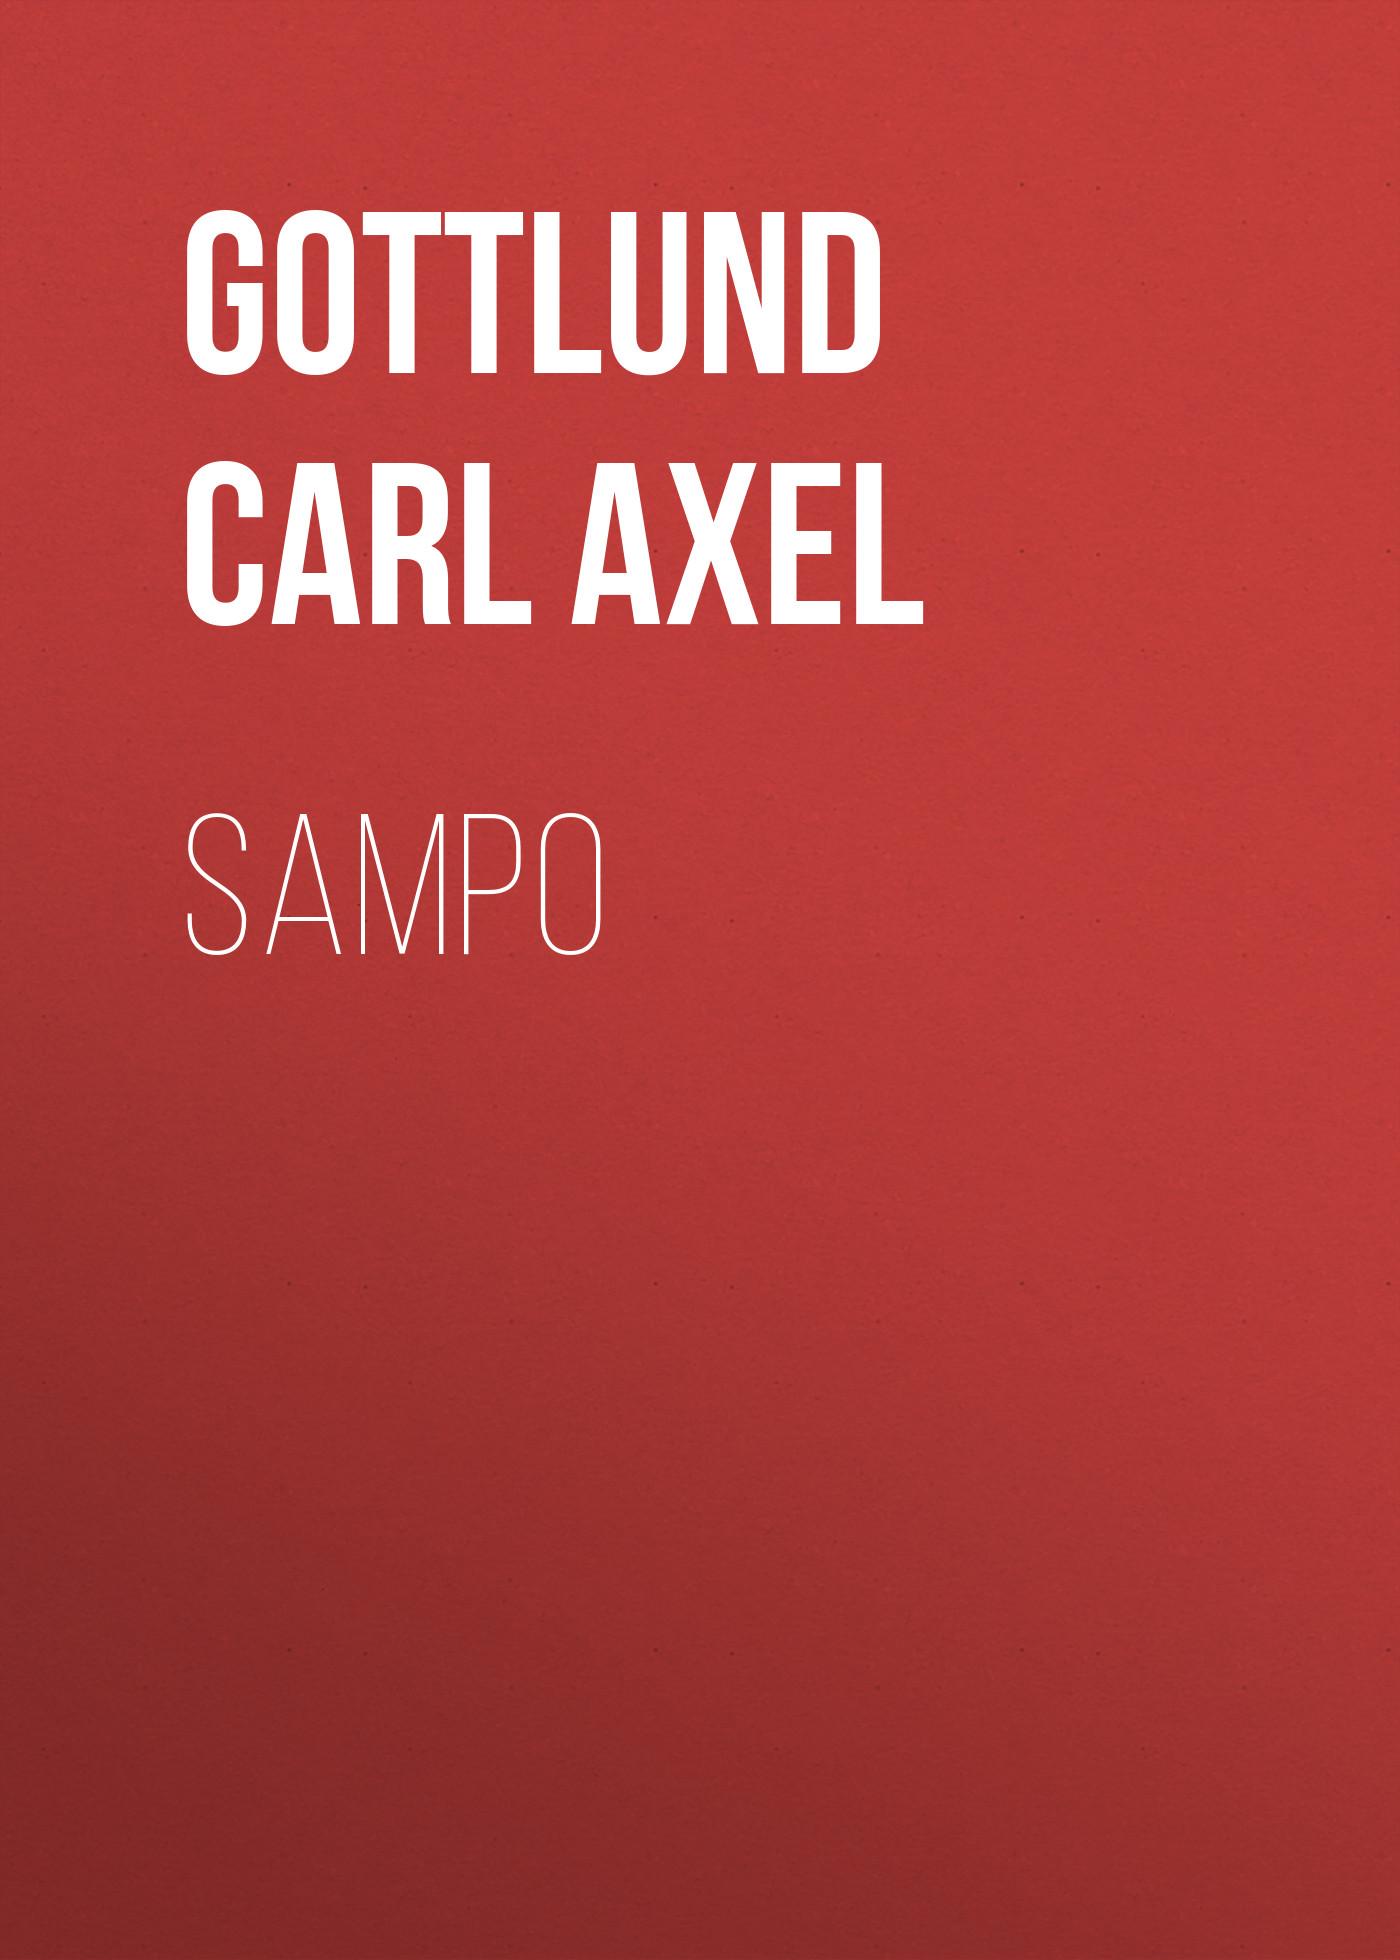 Gottlund Carl Axel Sampo цена